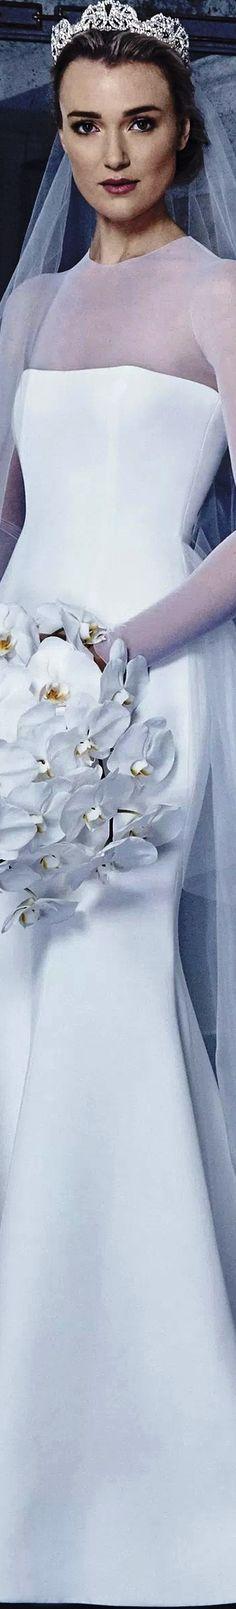 Romona Keveza Bridal Spring 2019 Romona Keveza, Bridal Collection, Formal Dresses, Wedding Dresses, One Shoulder Wedding Dress, Weddings, Bride, Celebrities, Spring